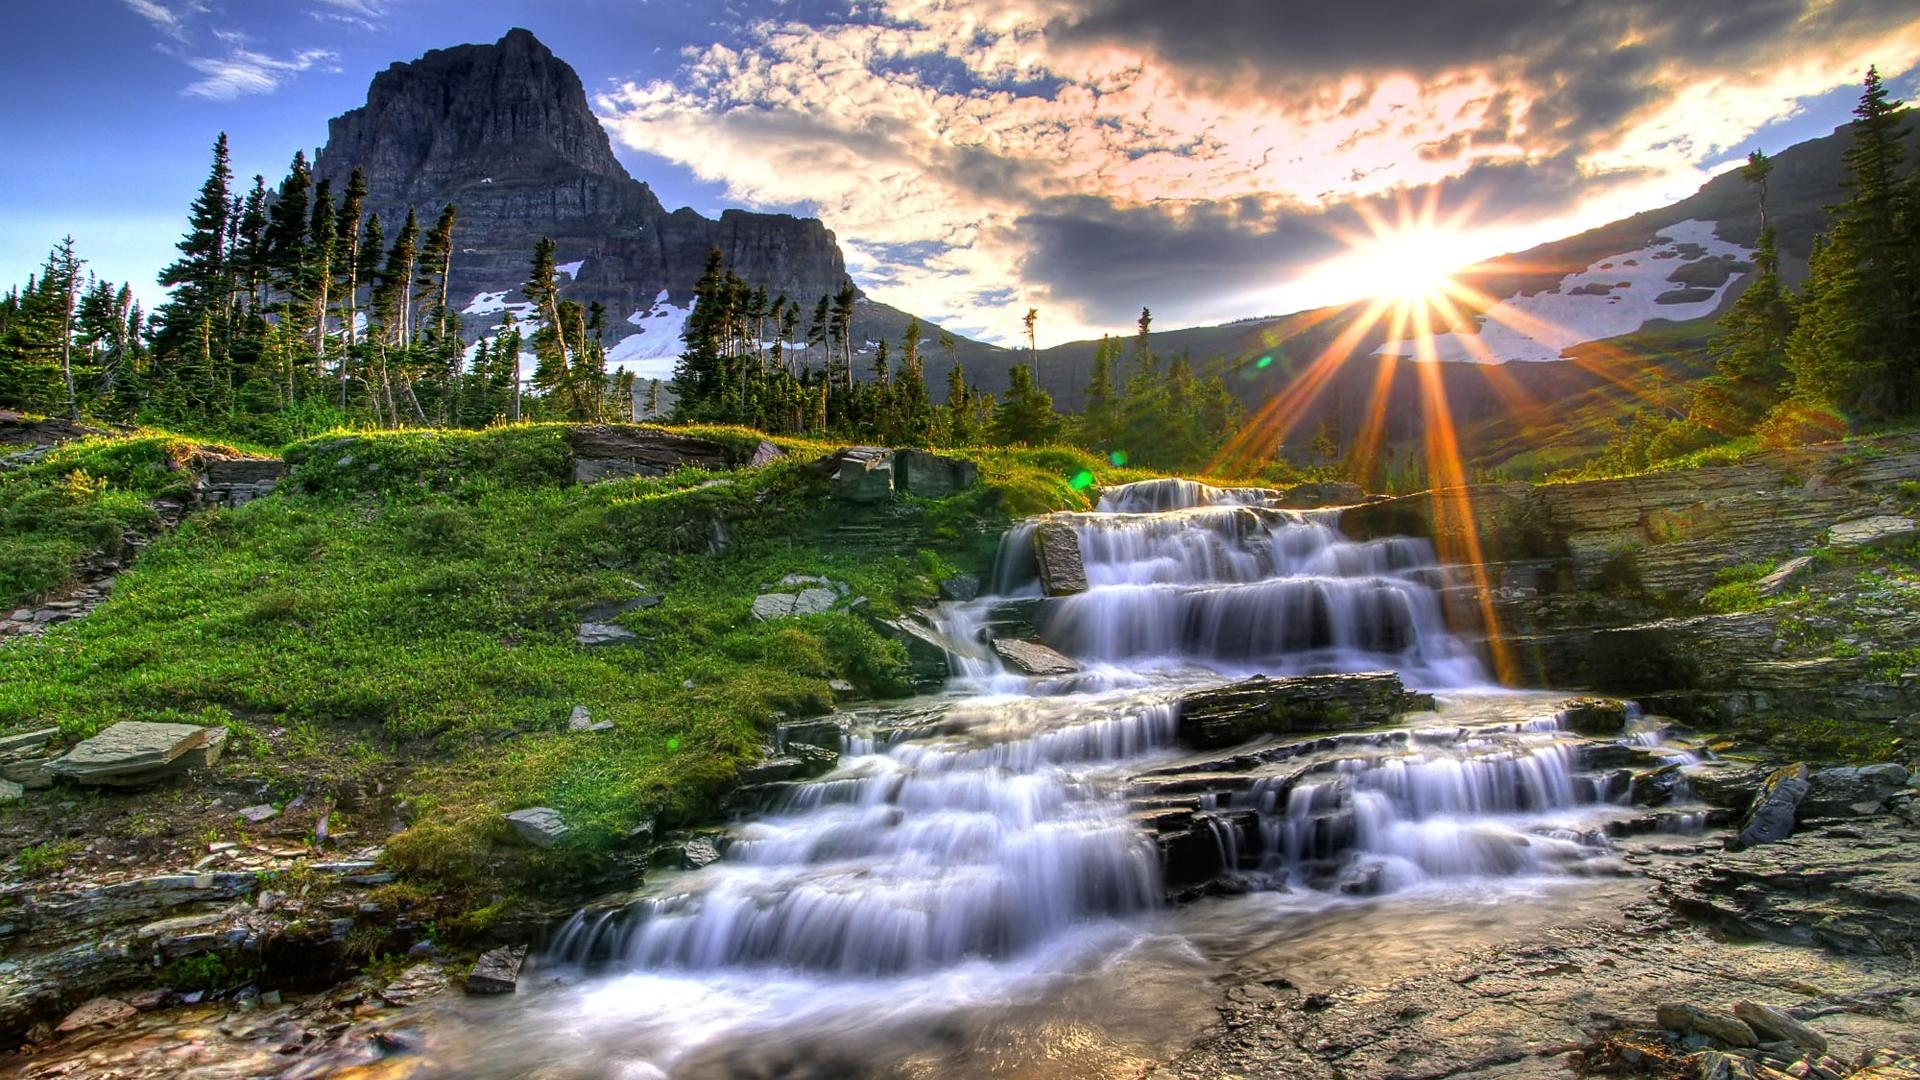 Nature Landscapes HD Wallpapers Landscape Desktop Images 1920x1080